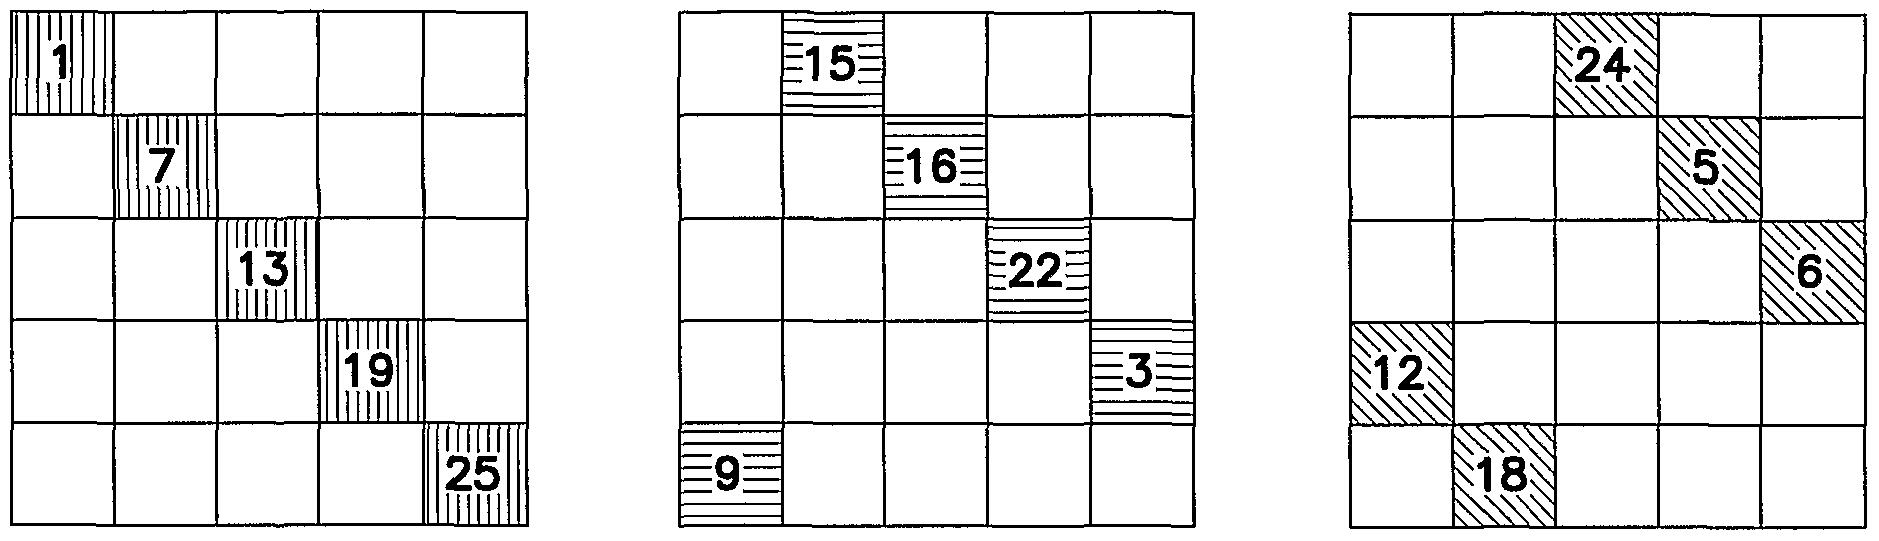 WO2000016294A9 - Magic squares game - Google Patents